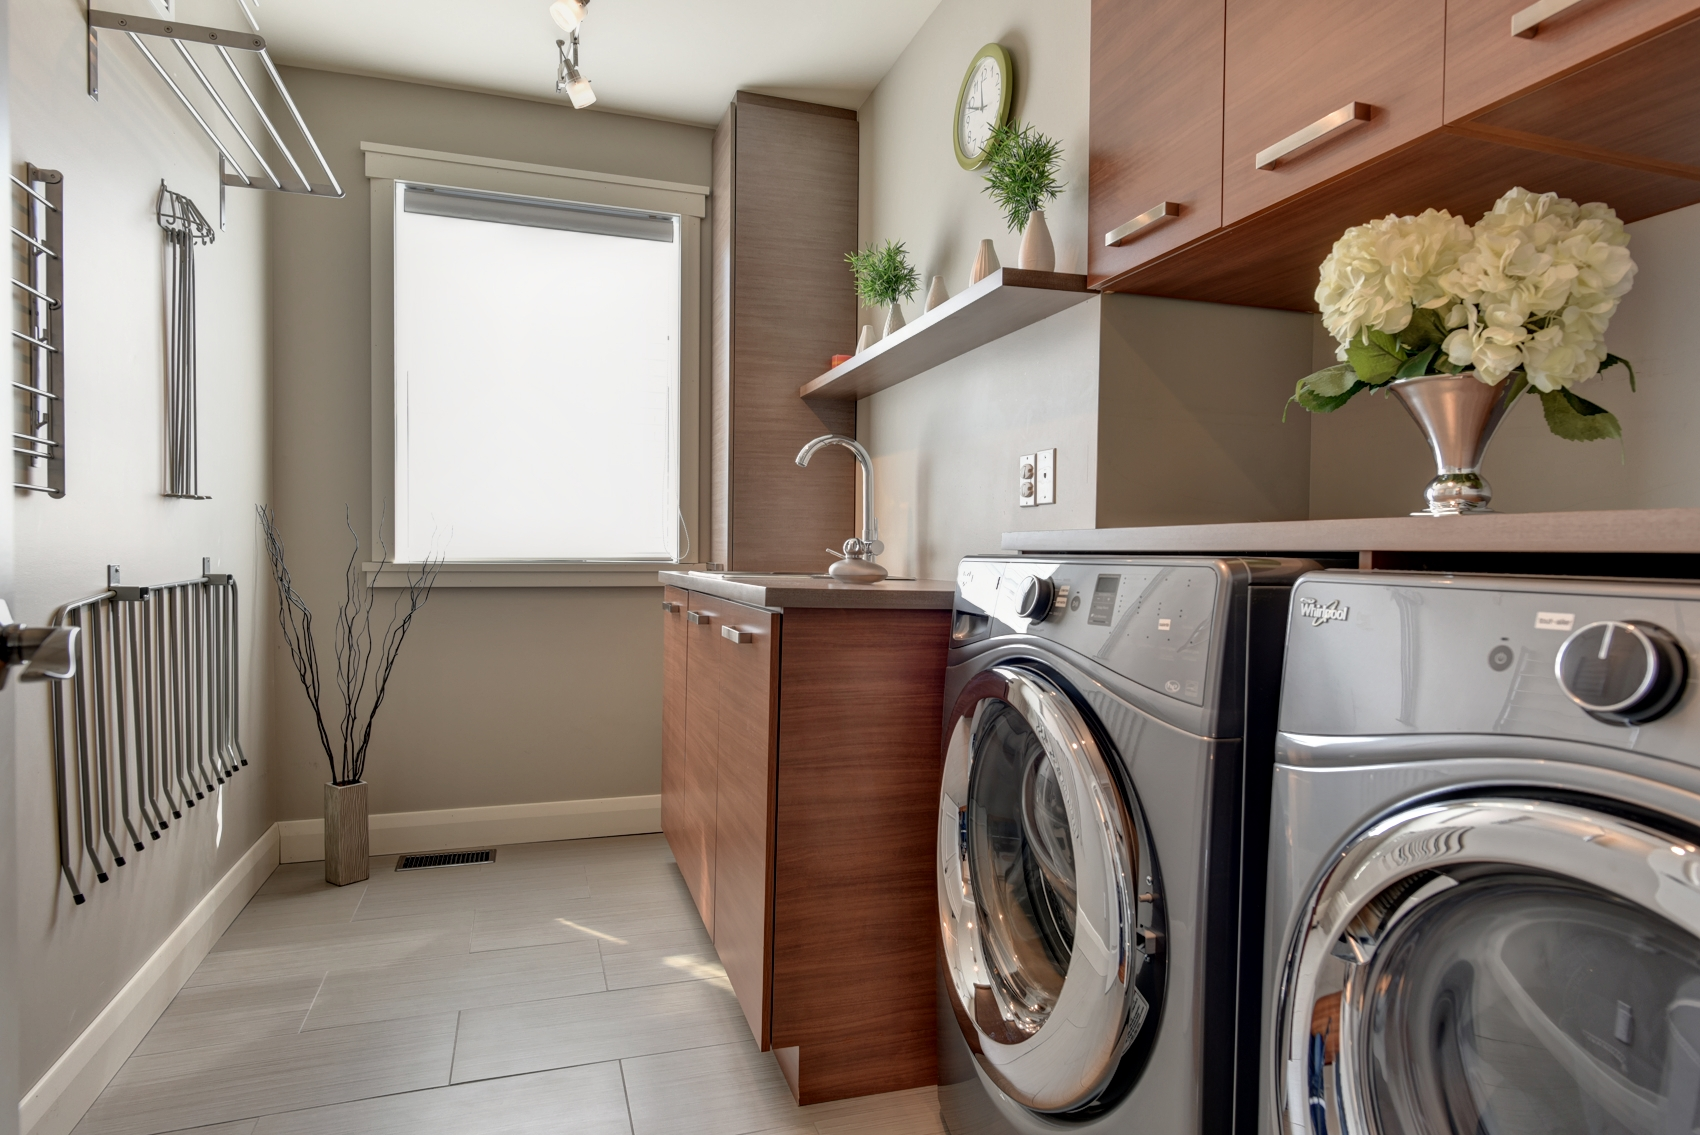 salle de lavage.jpg